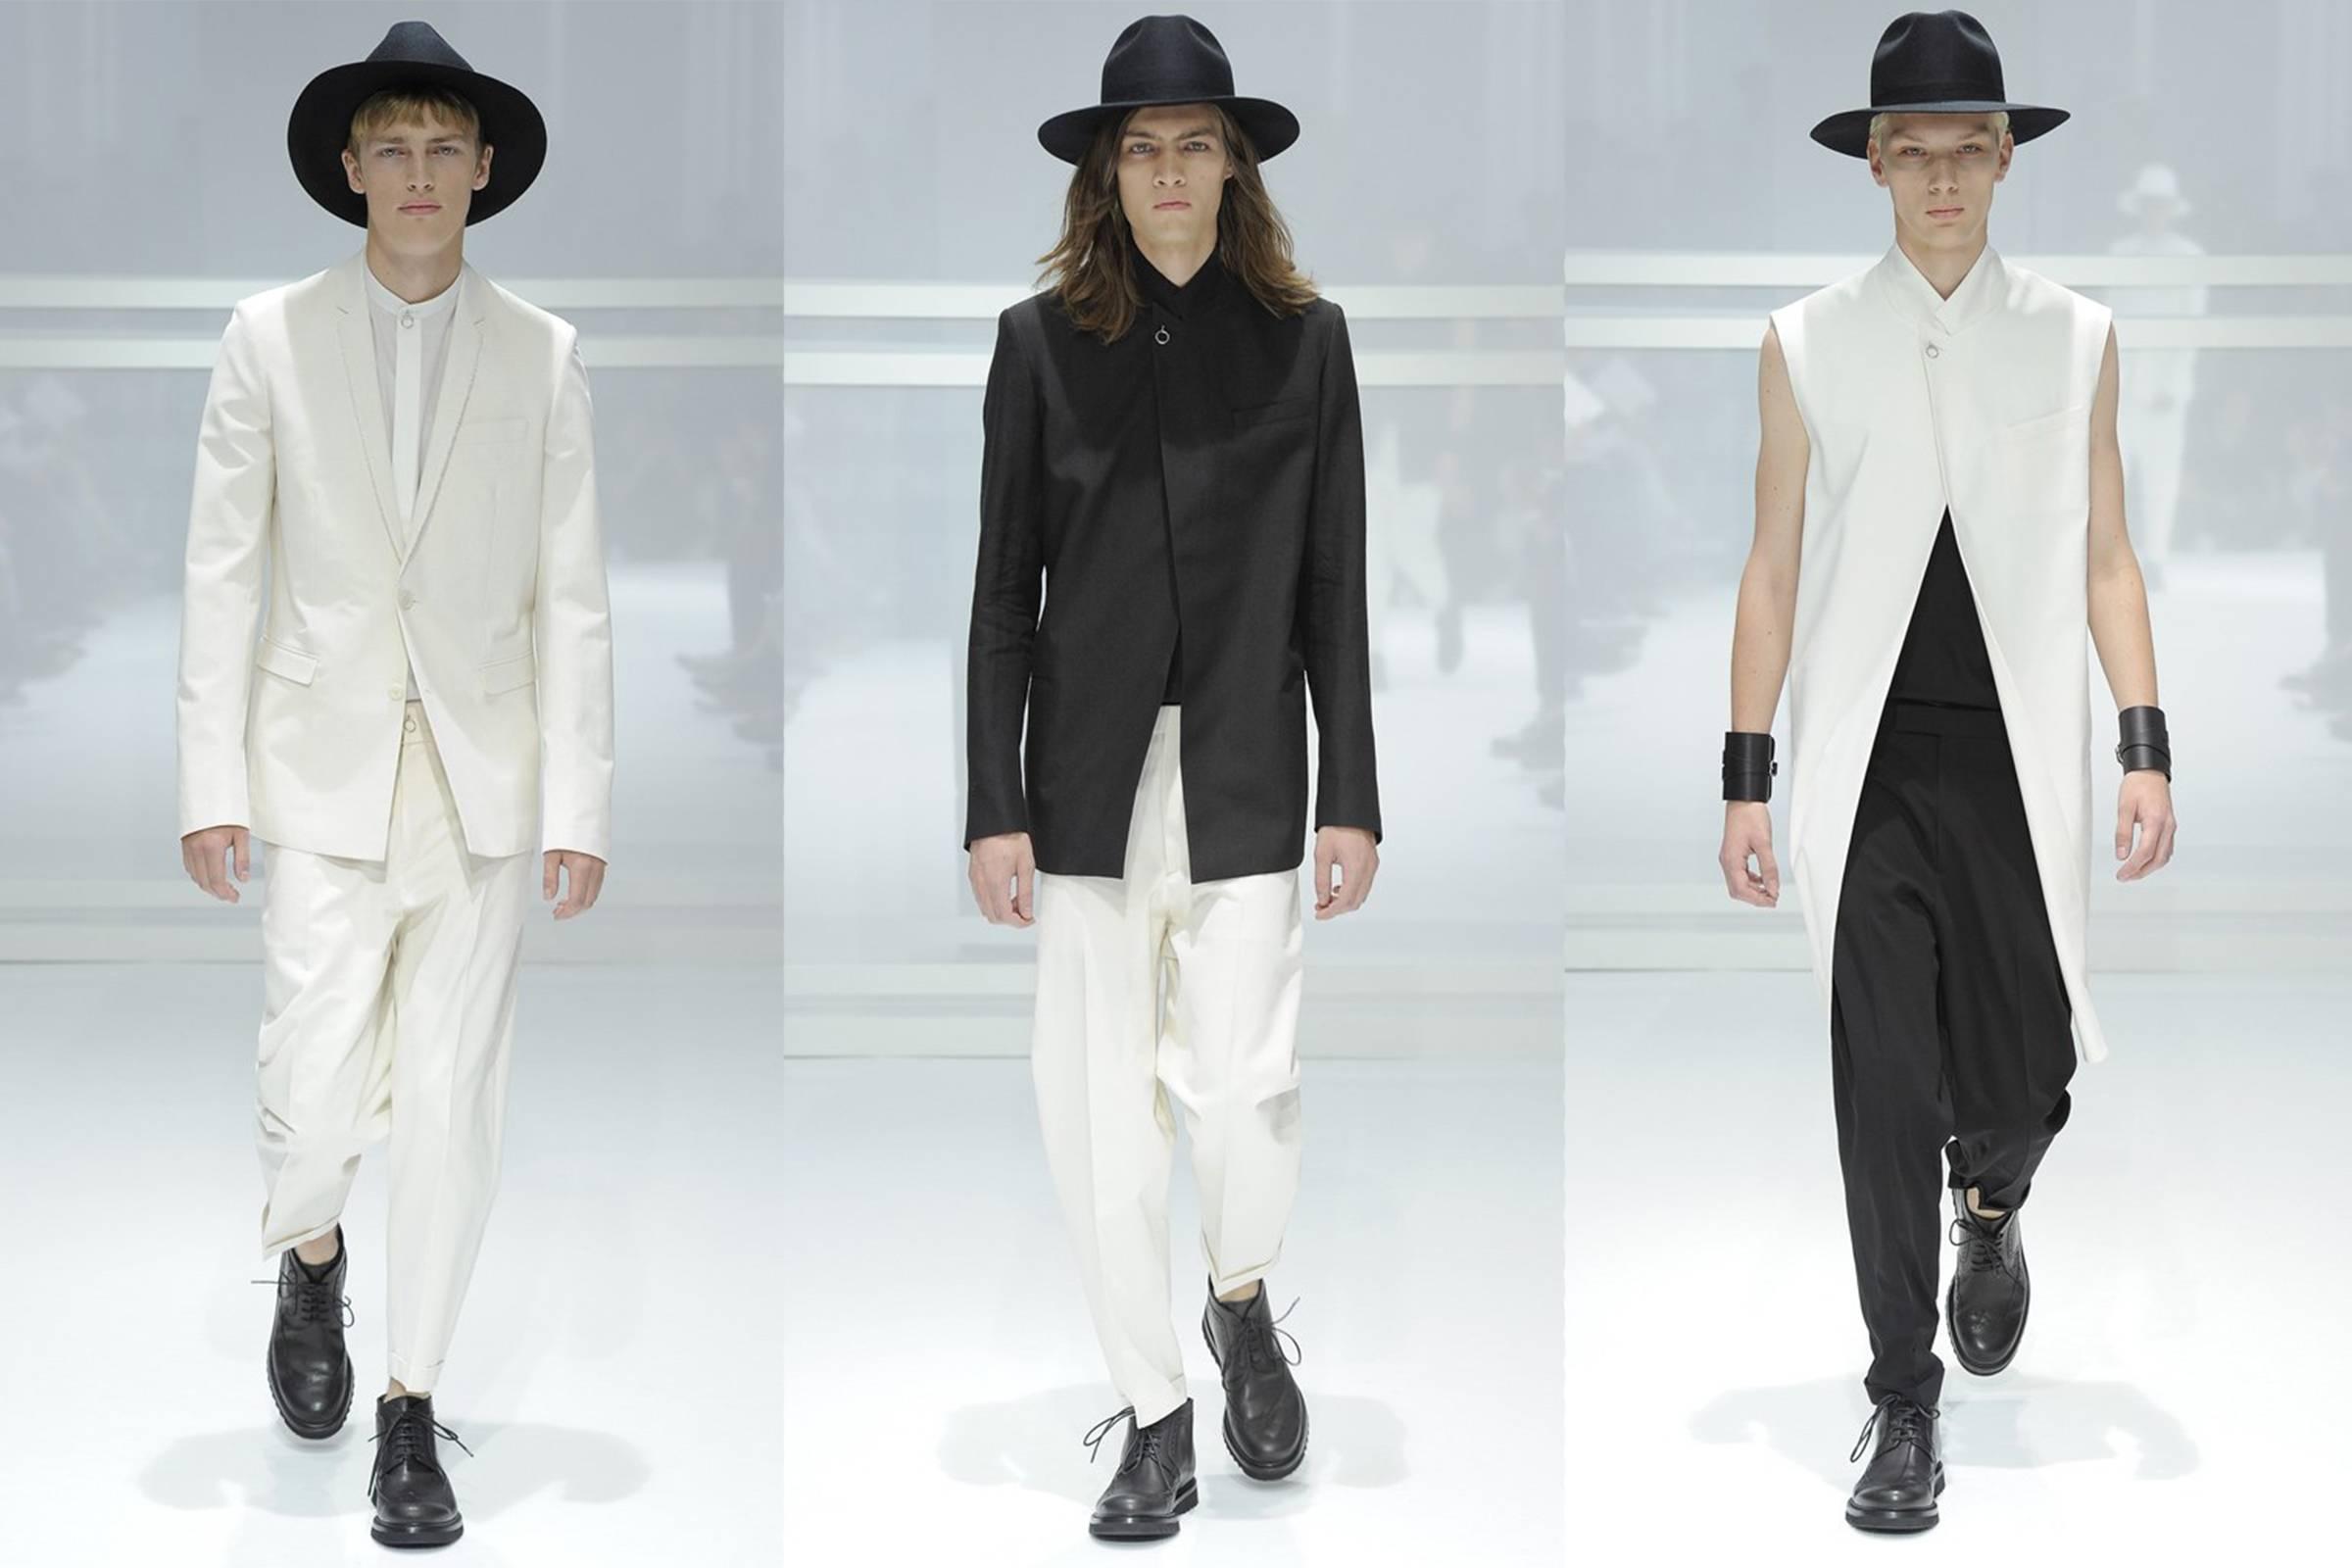 Dior Homme Spring/Summer 2012